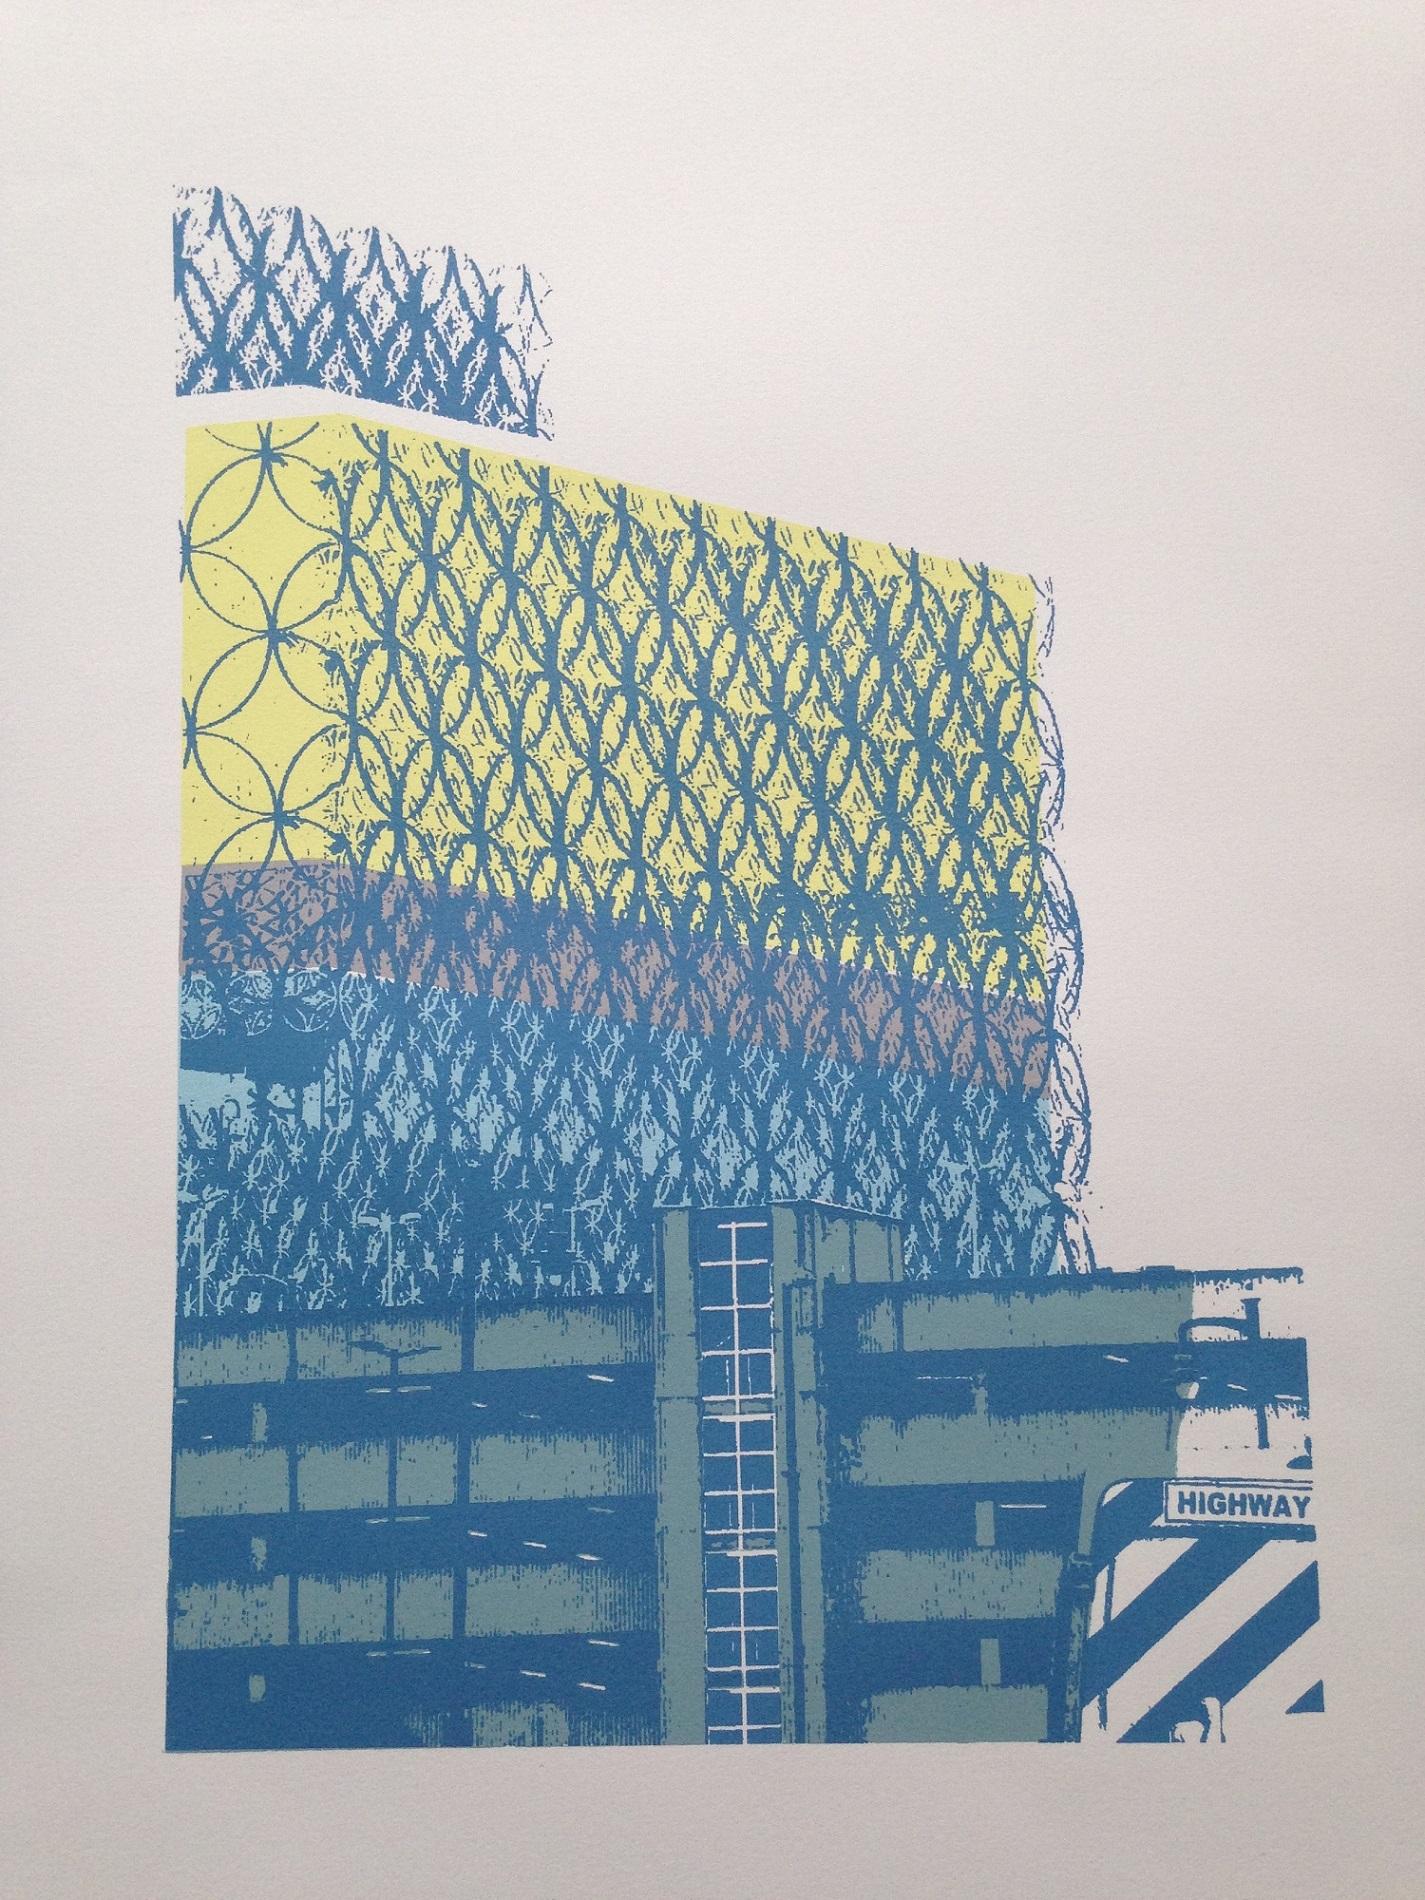 'Library of Birmingham'